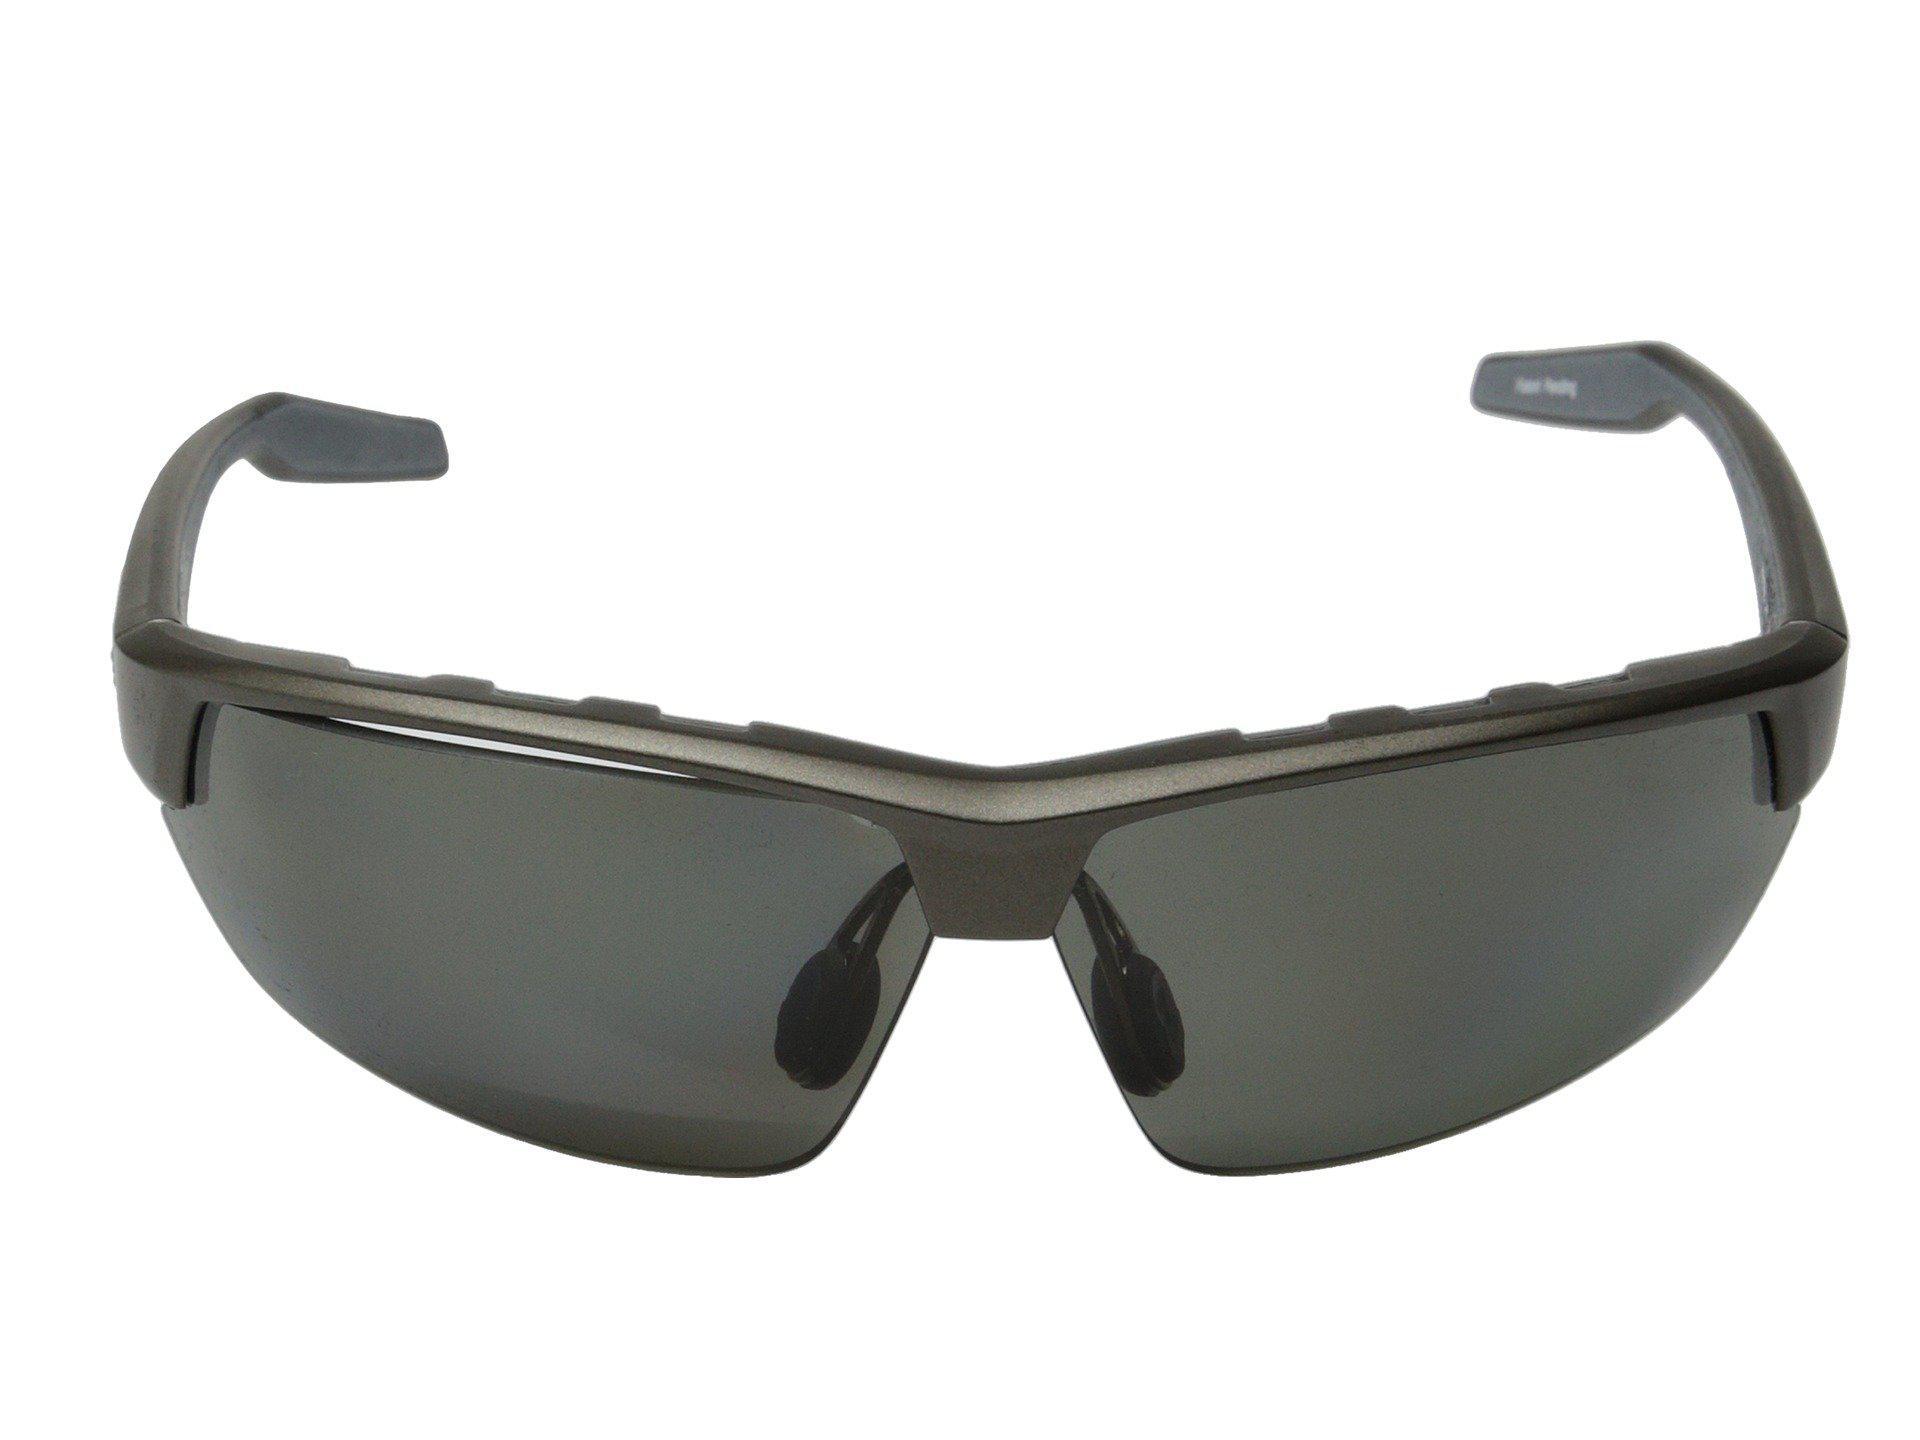 0a1b4dc10ee Native Eyewear - Black Hardtop Ultra (charcoal gray) Sport Sunglasses for  Men -. View fullscreen